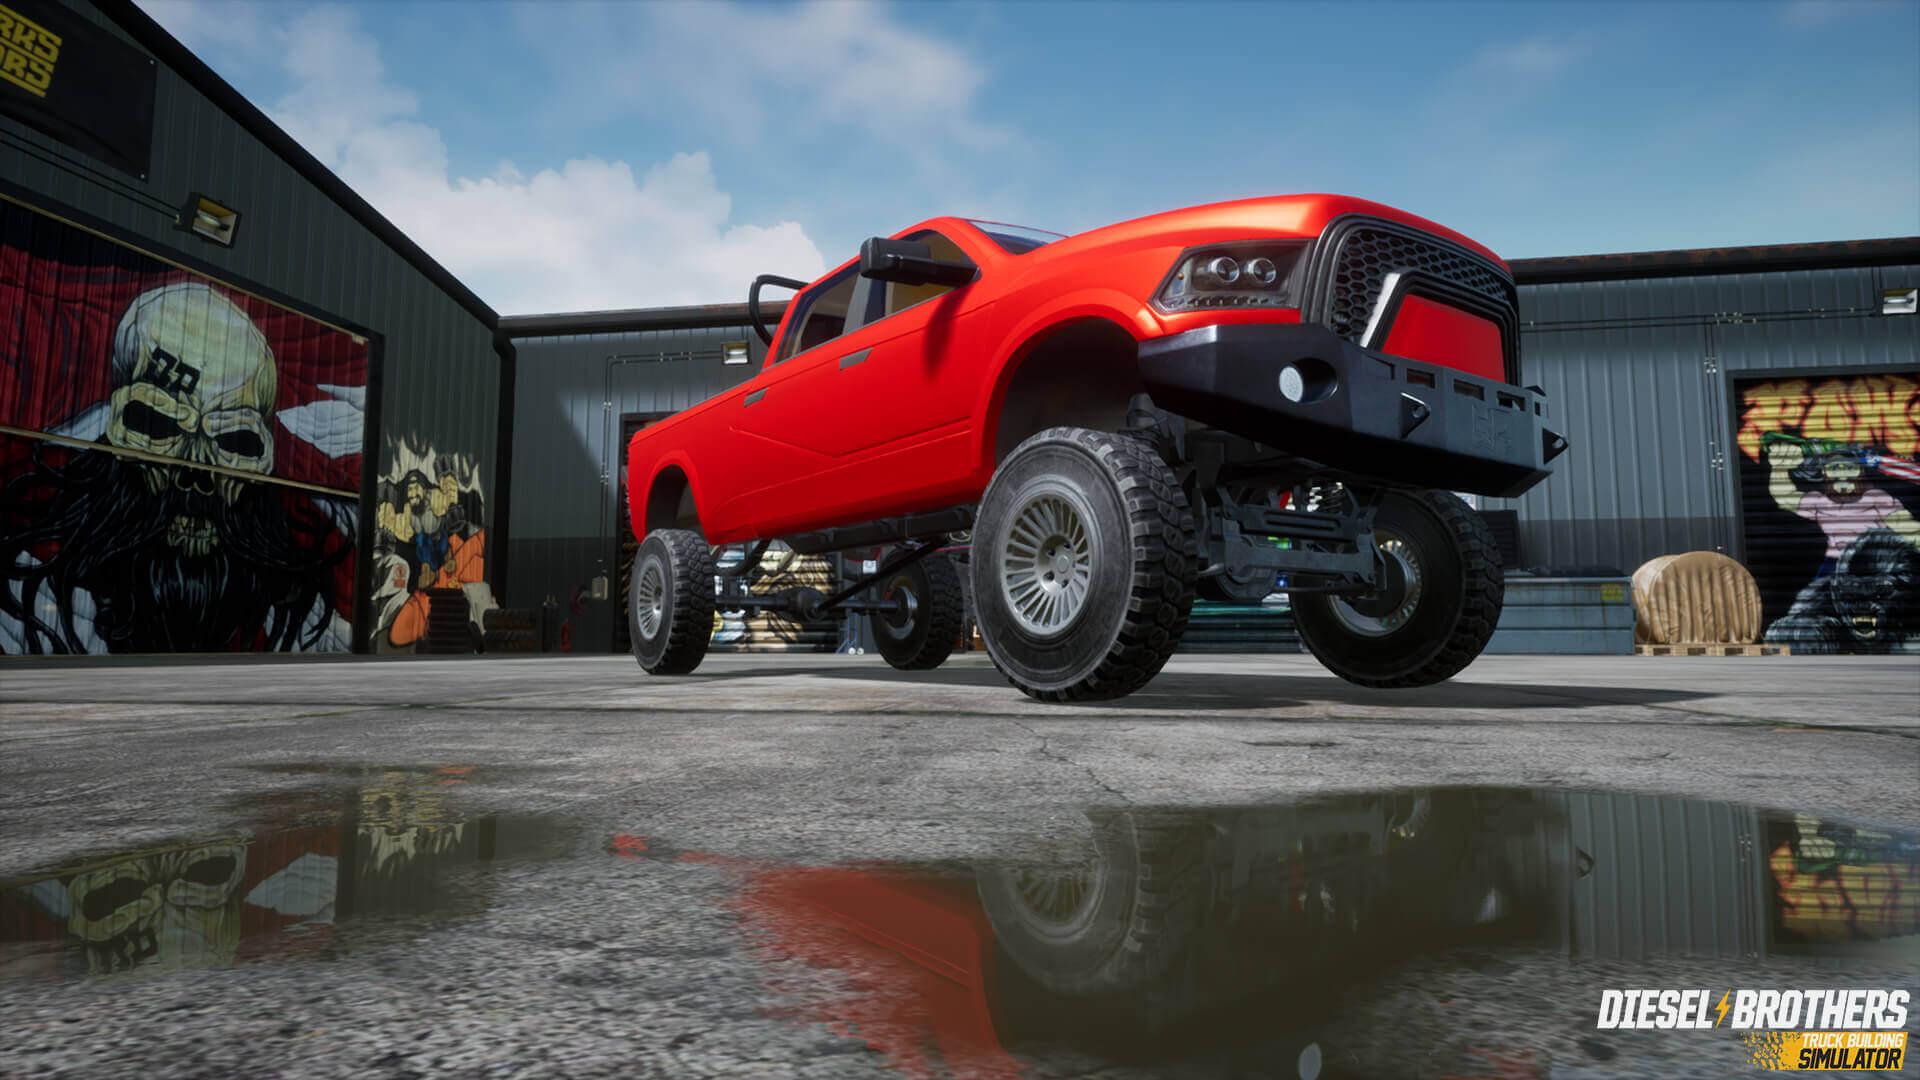 Diesel Brothers: Truck Building Simulator Editor - Za darmo na Epic Store